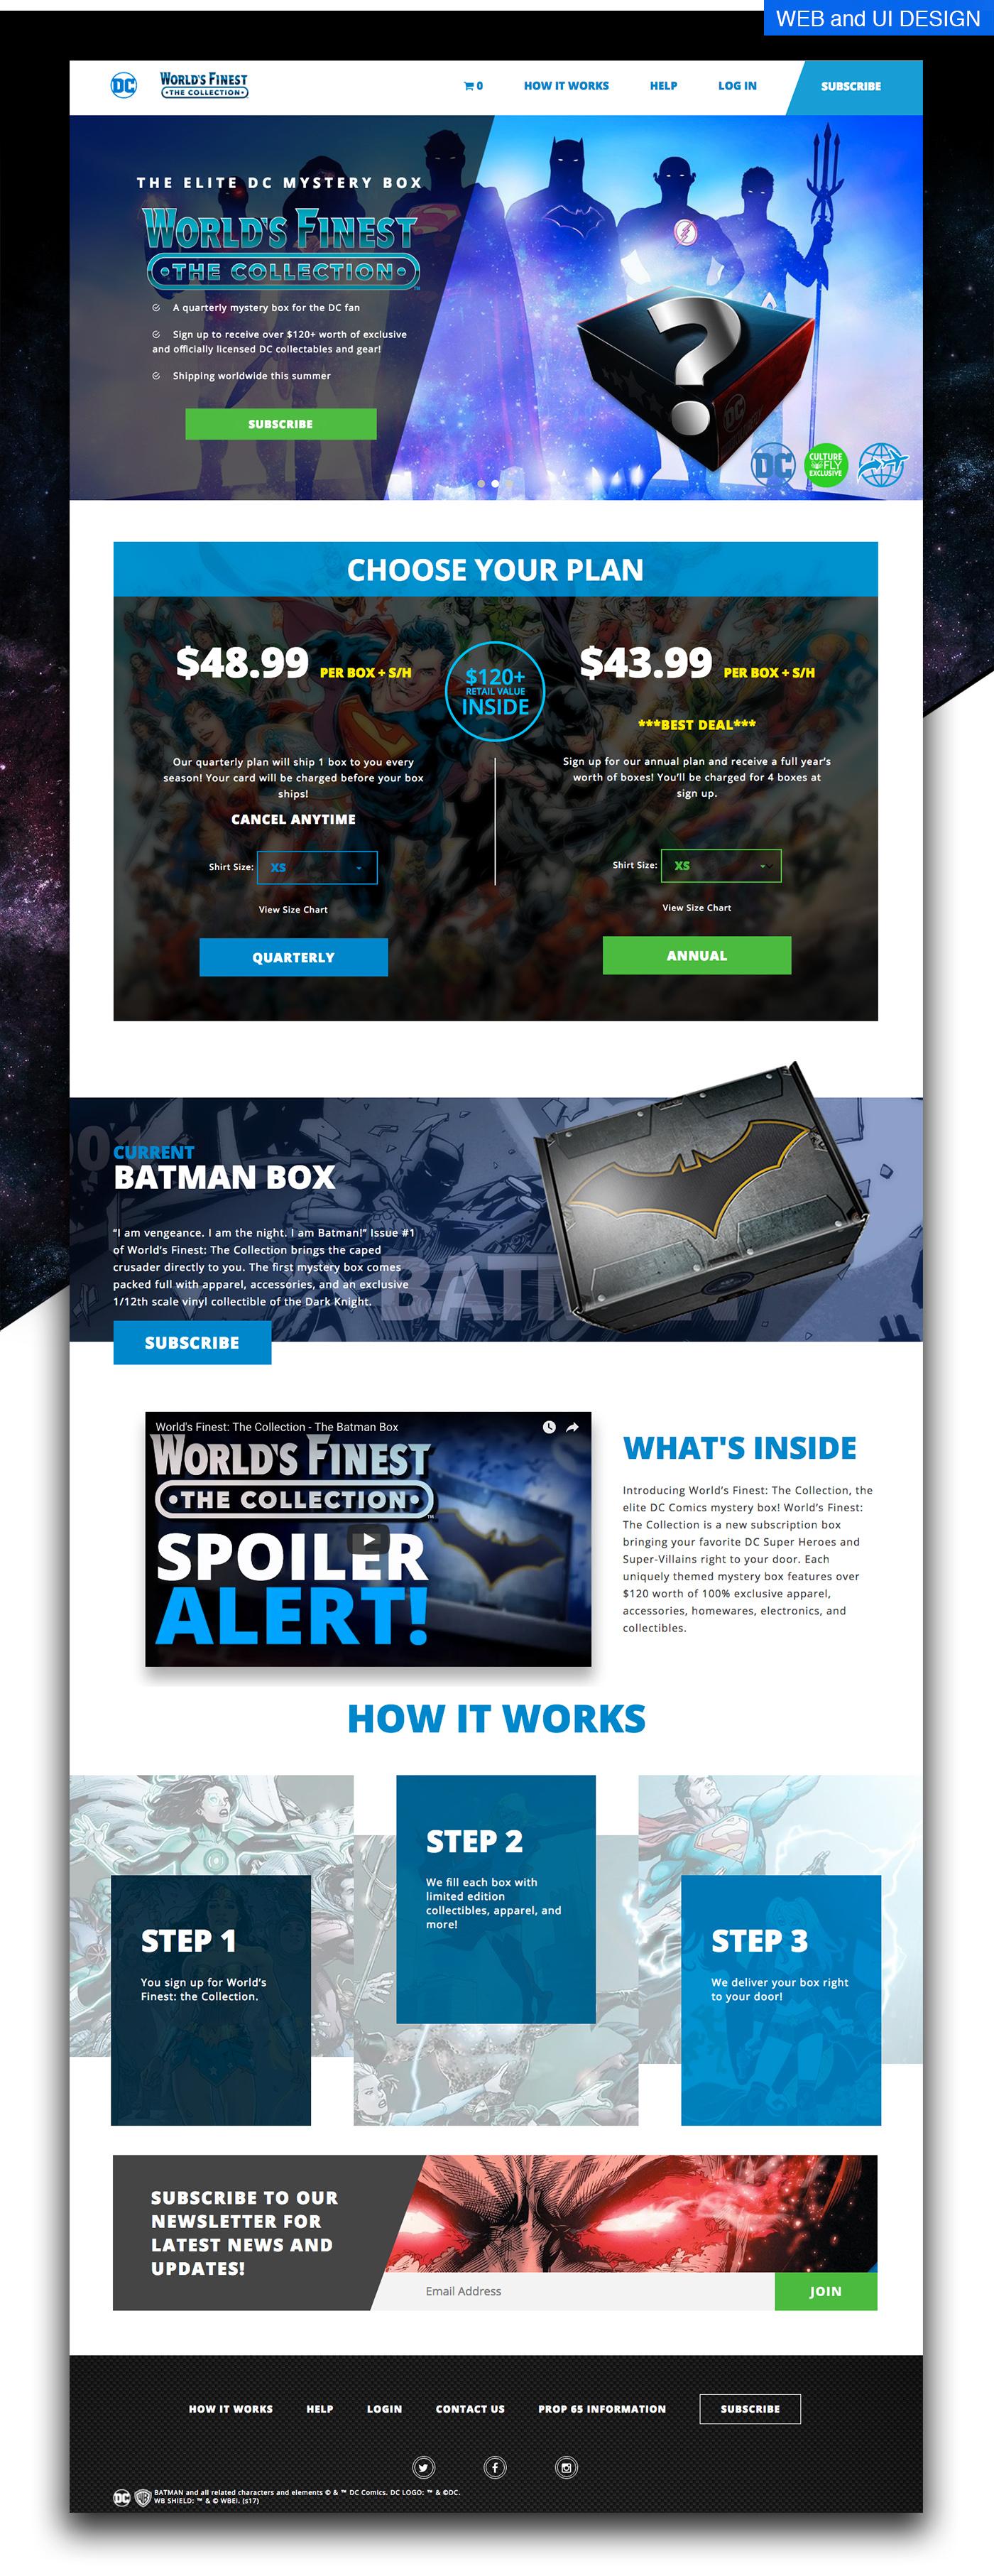 superman marketing   branding  UI/UX graphic design  Packaging comics